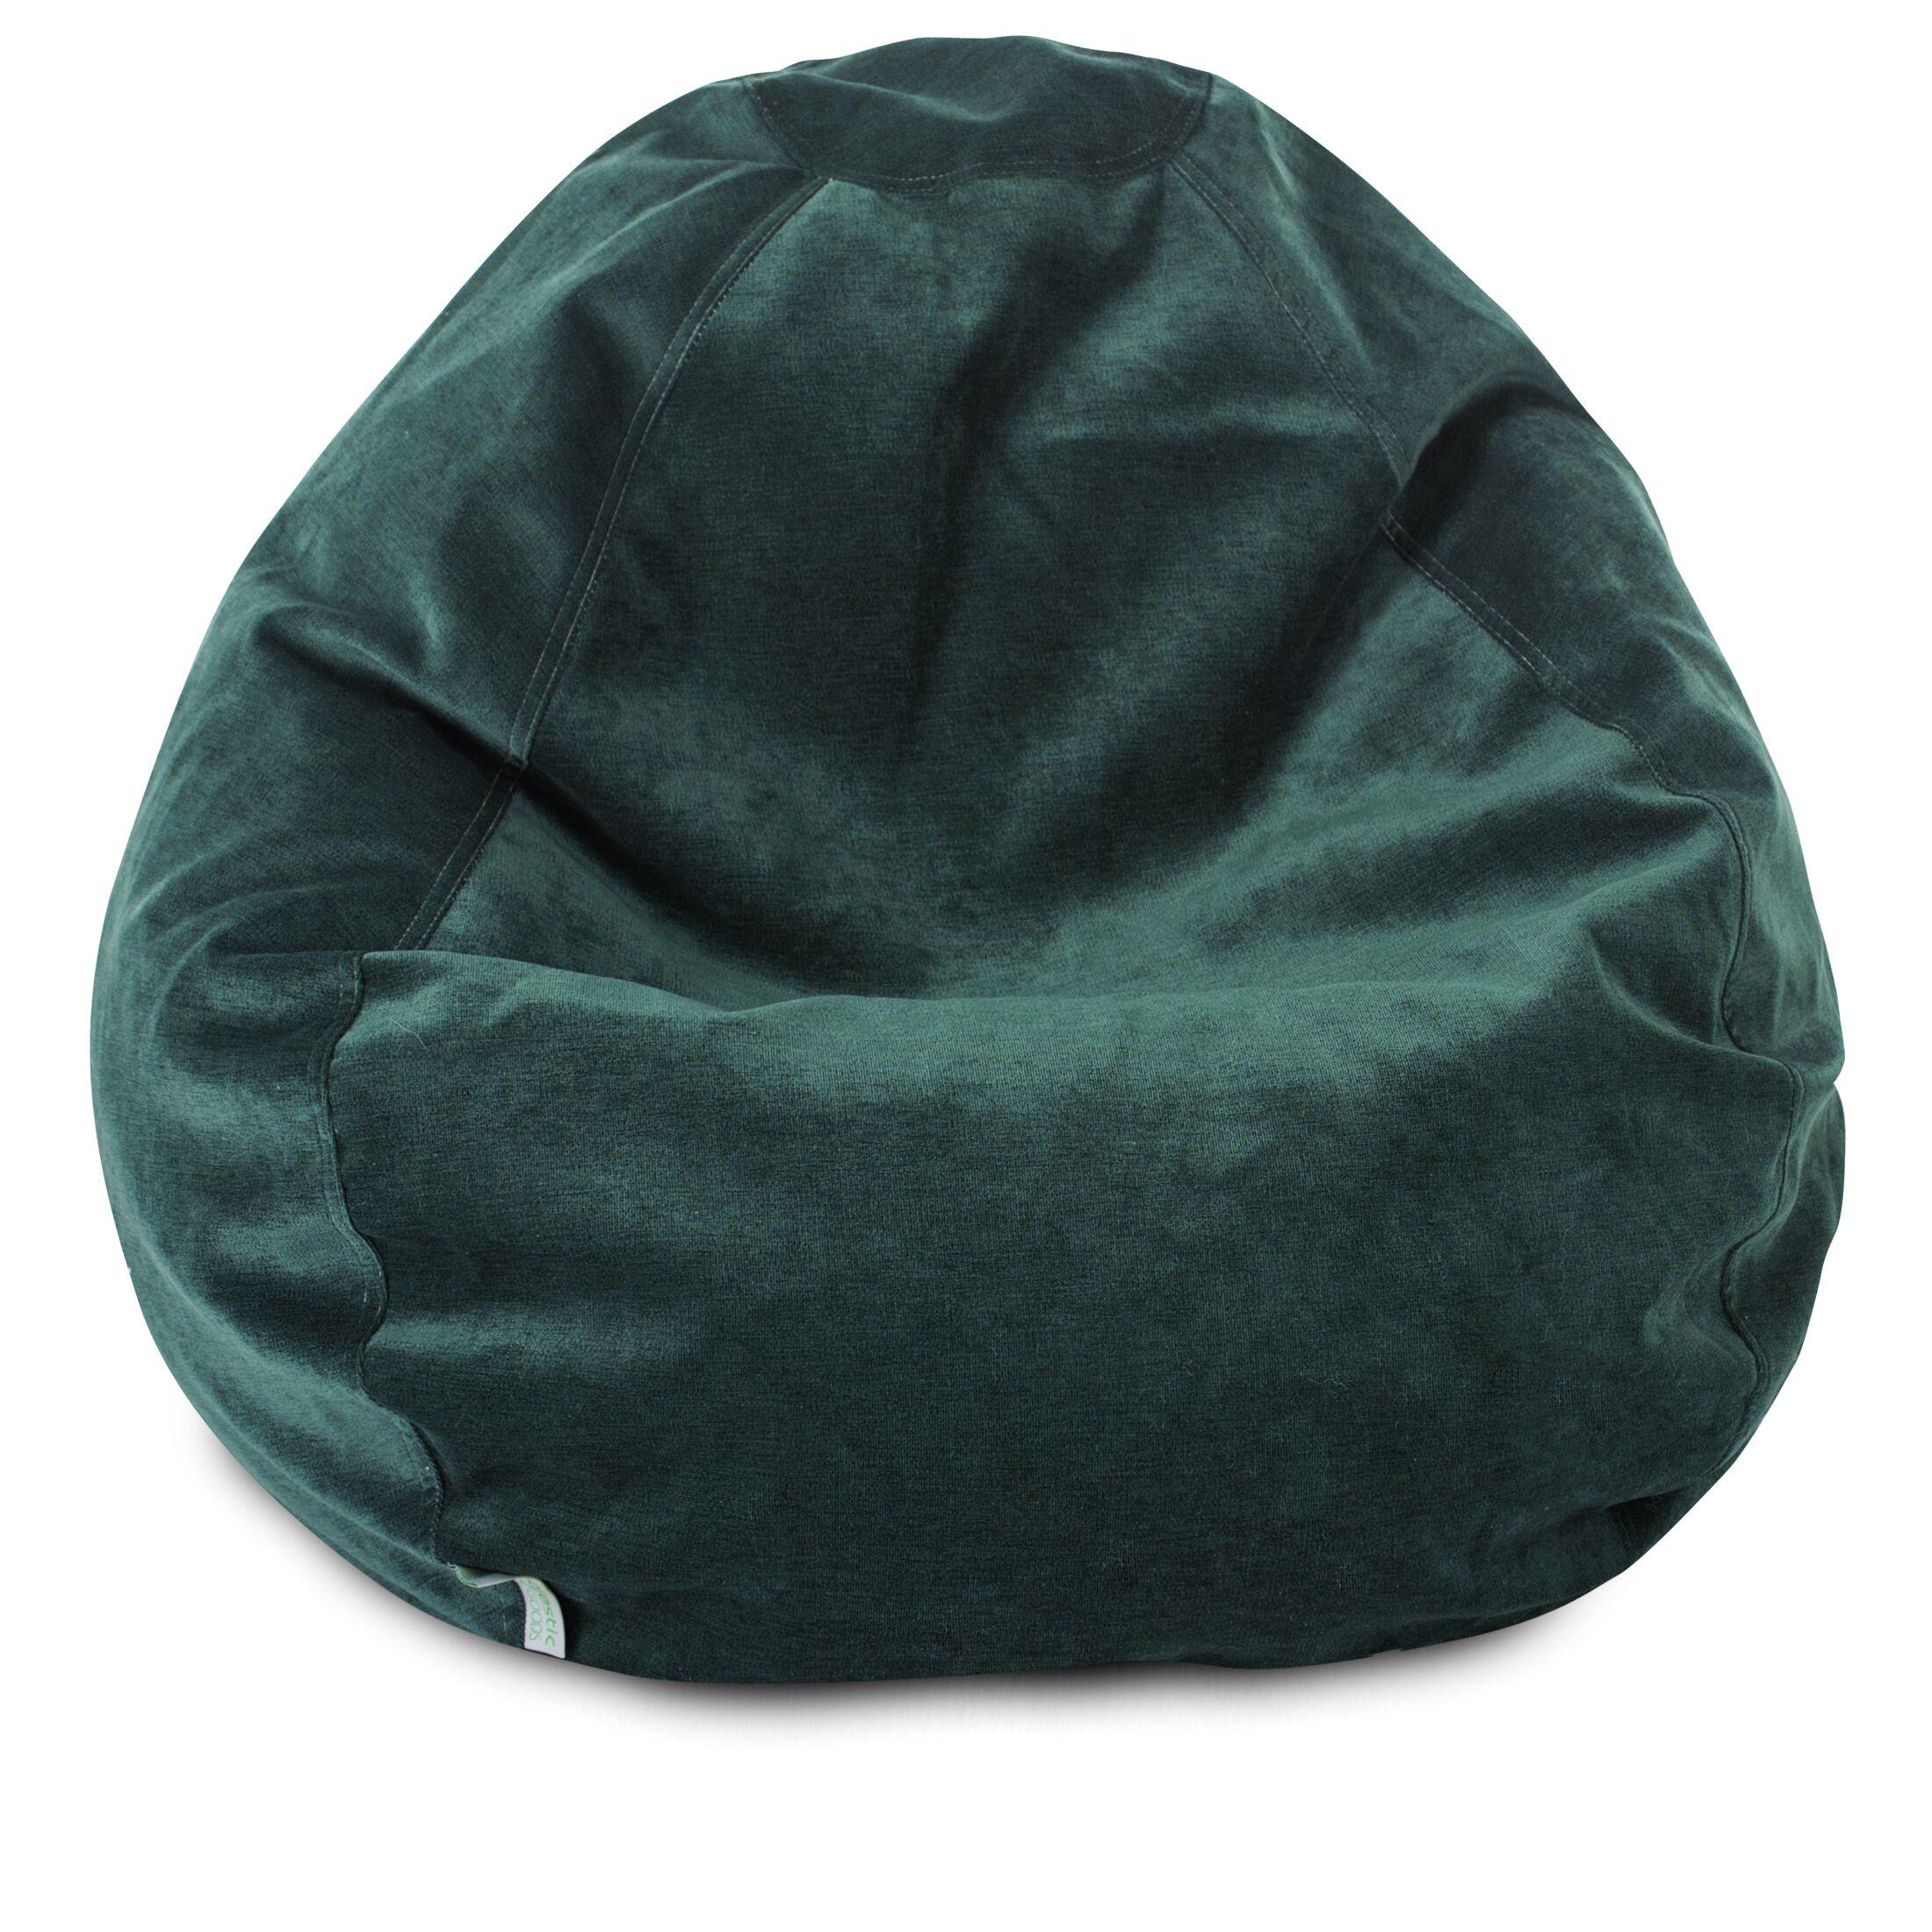 Micro Velvet Bean Bag Chair Color: Marine